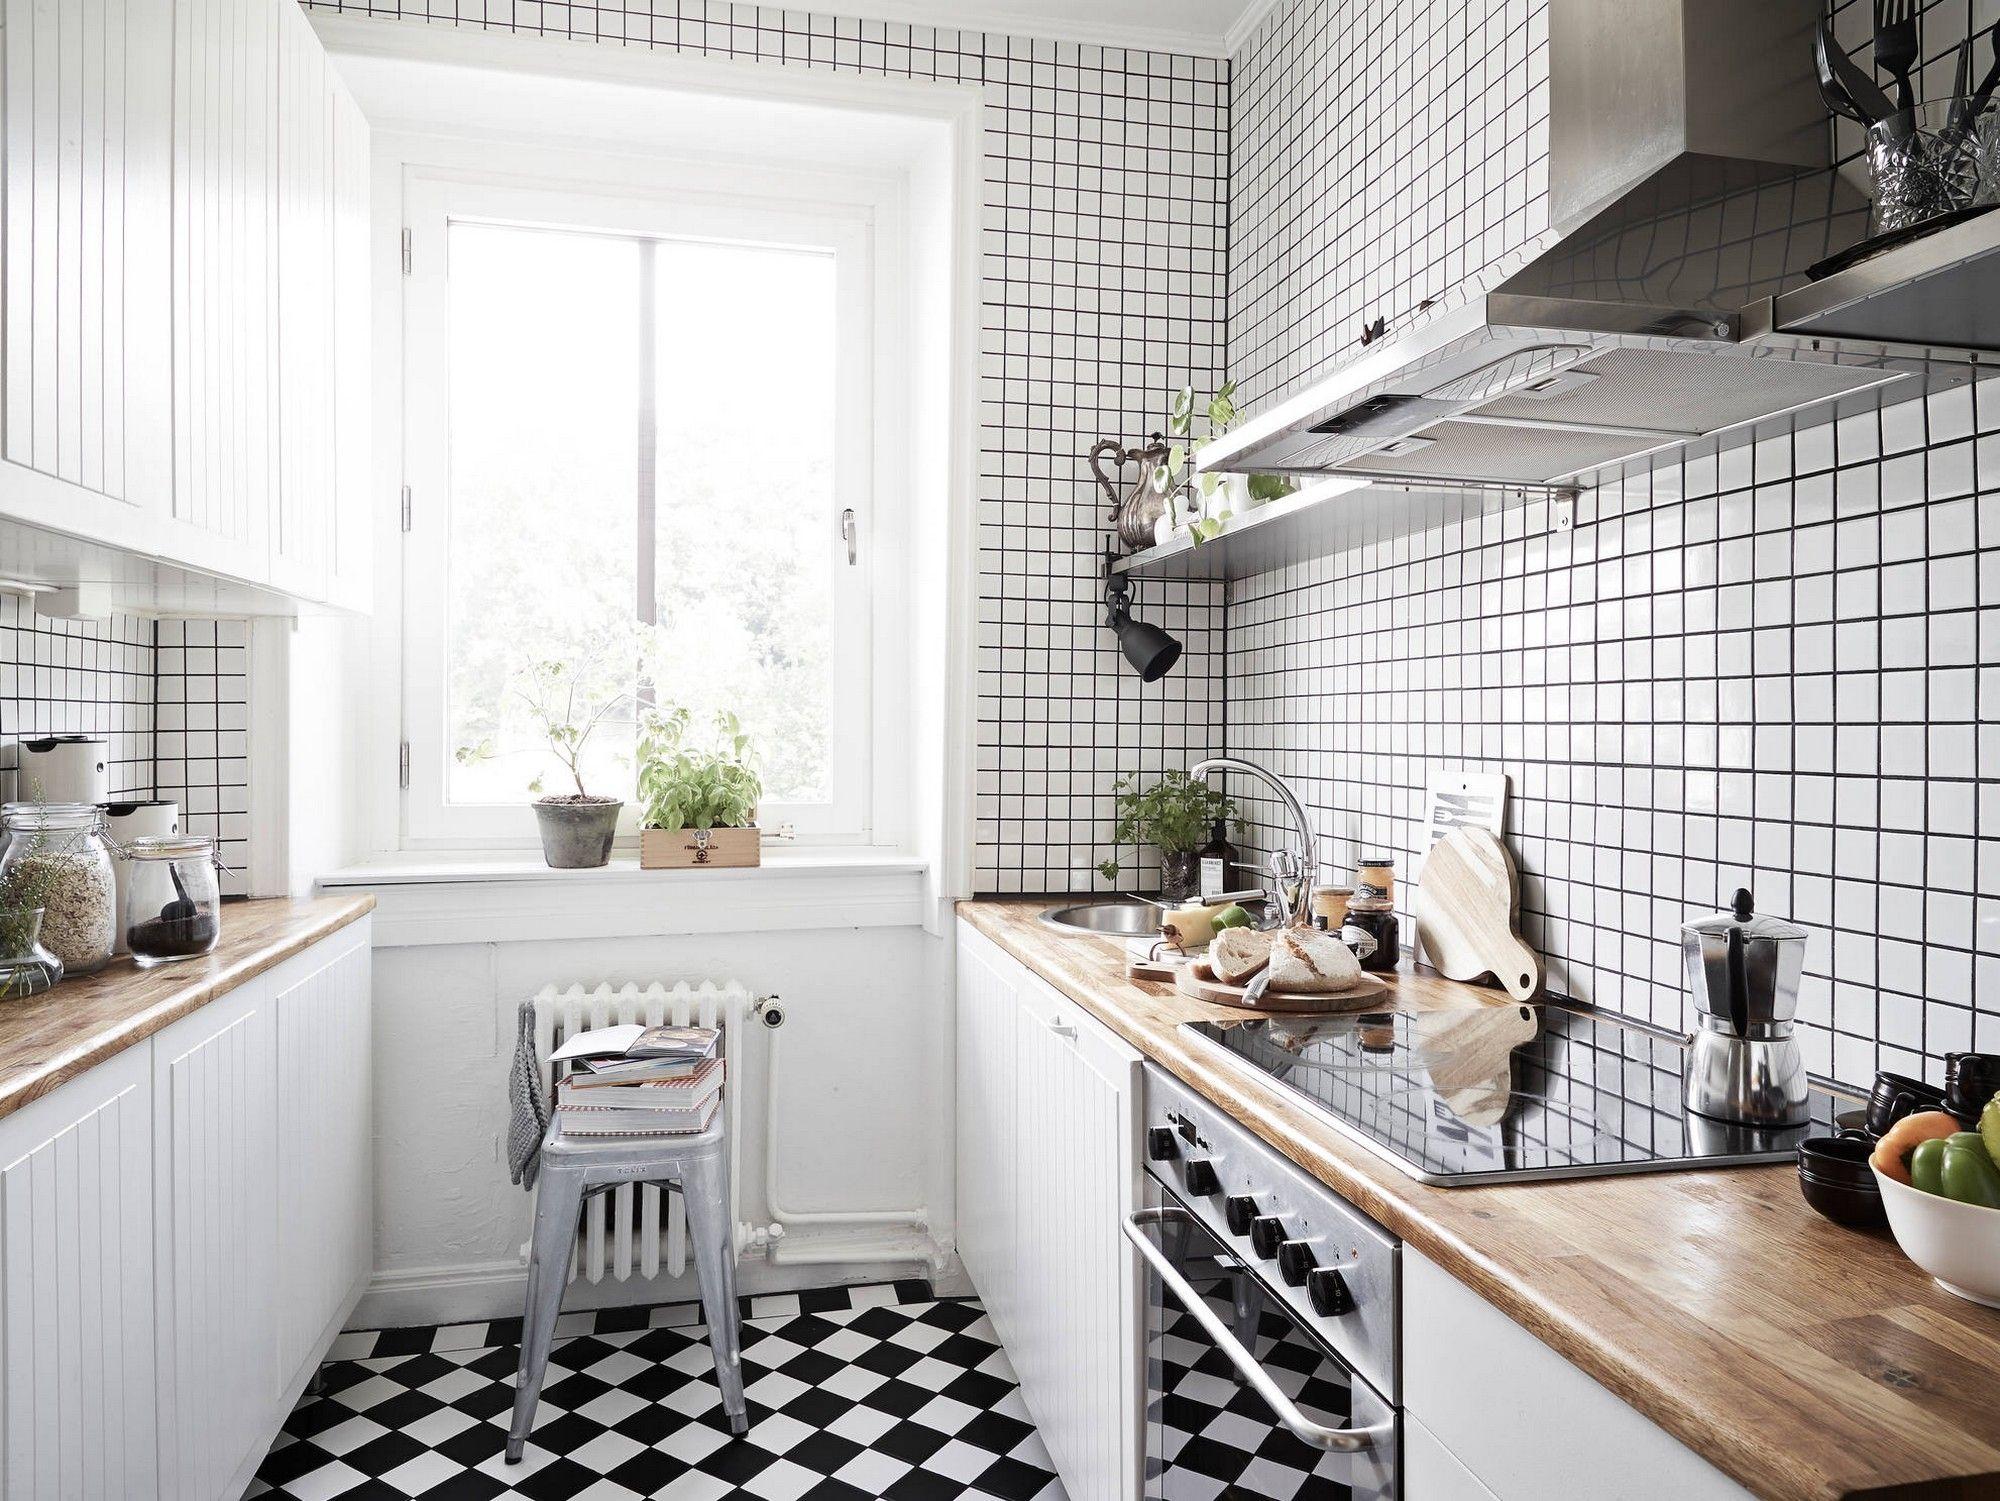 Clic Kitchen Floor Tiles Black And White